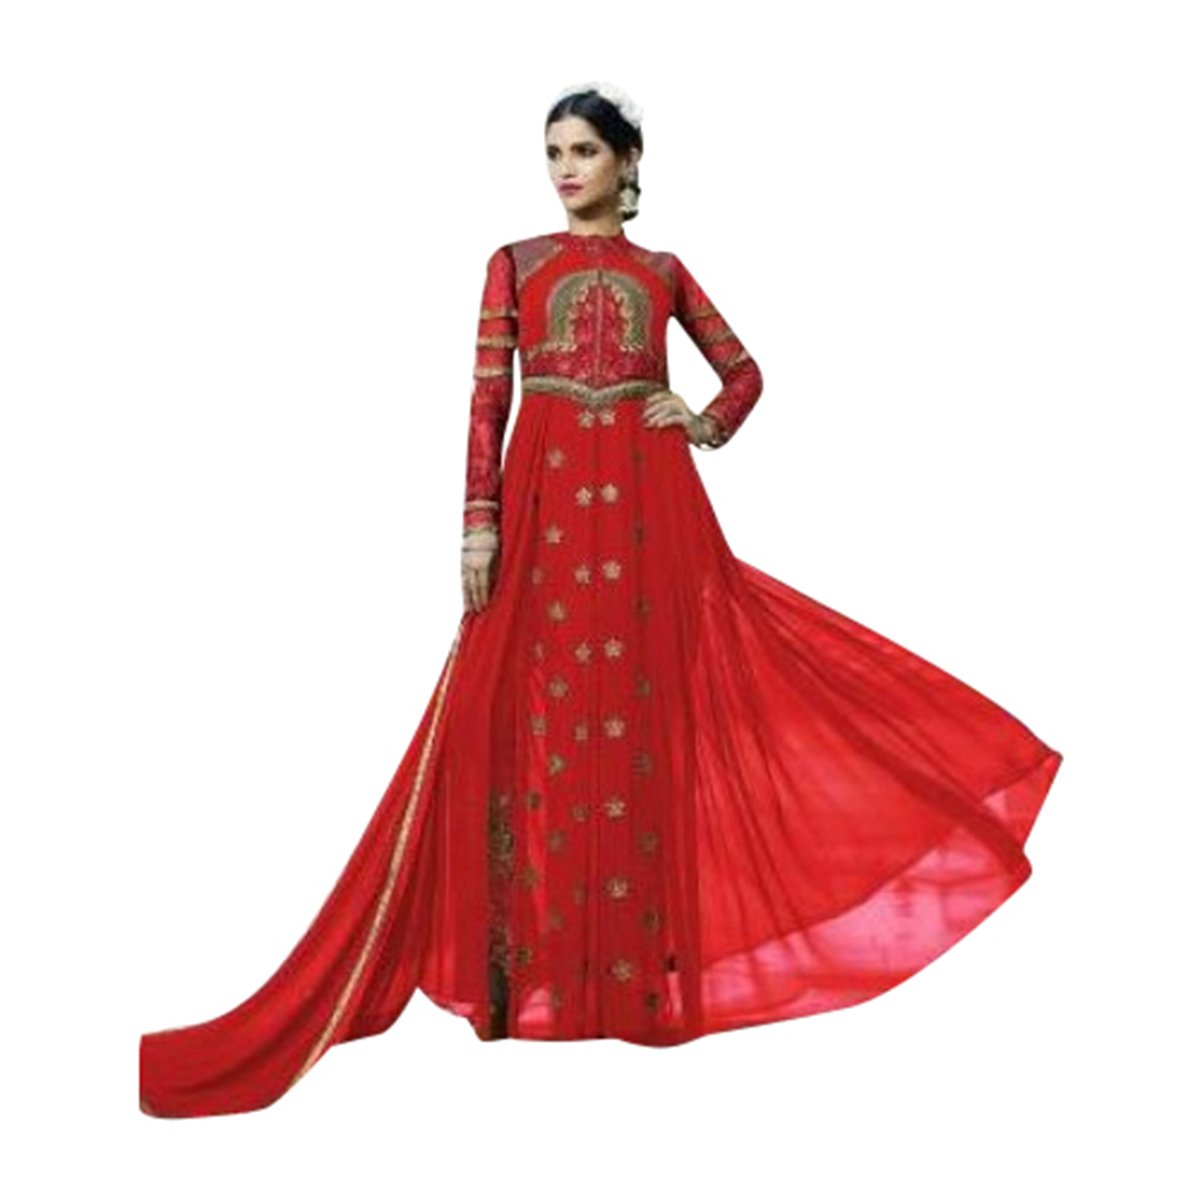 Red Festival Bollywood Collection Anarkali Salwar Ceremony Punjabi Women suit 550